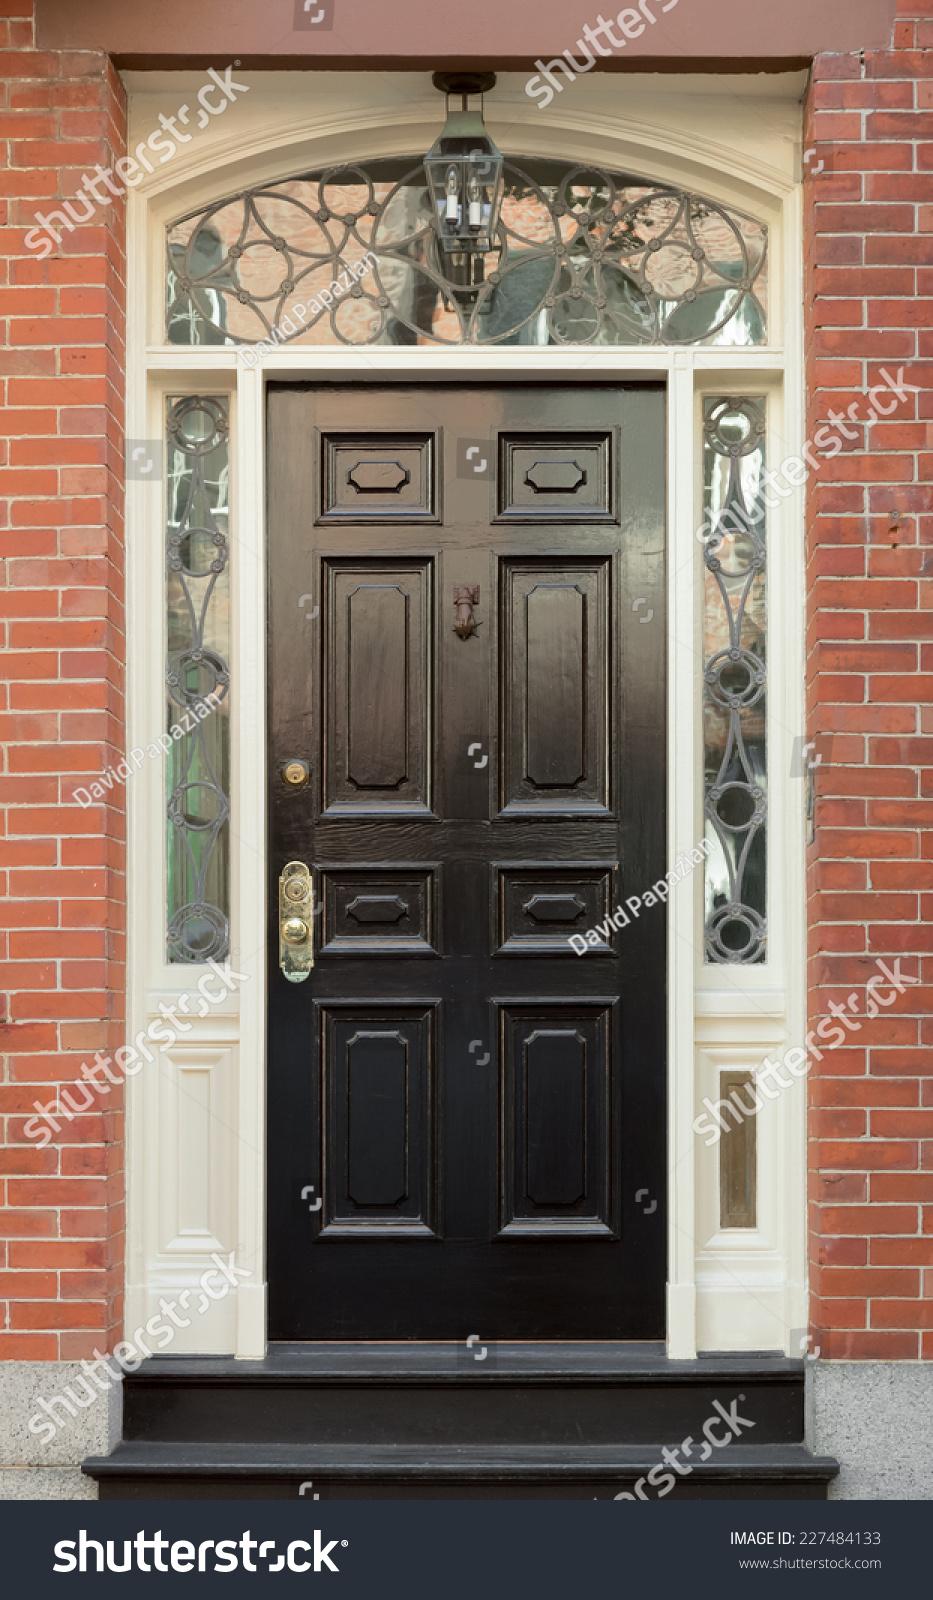 black front door and surrounding white door frame with ornate windows in brick building